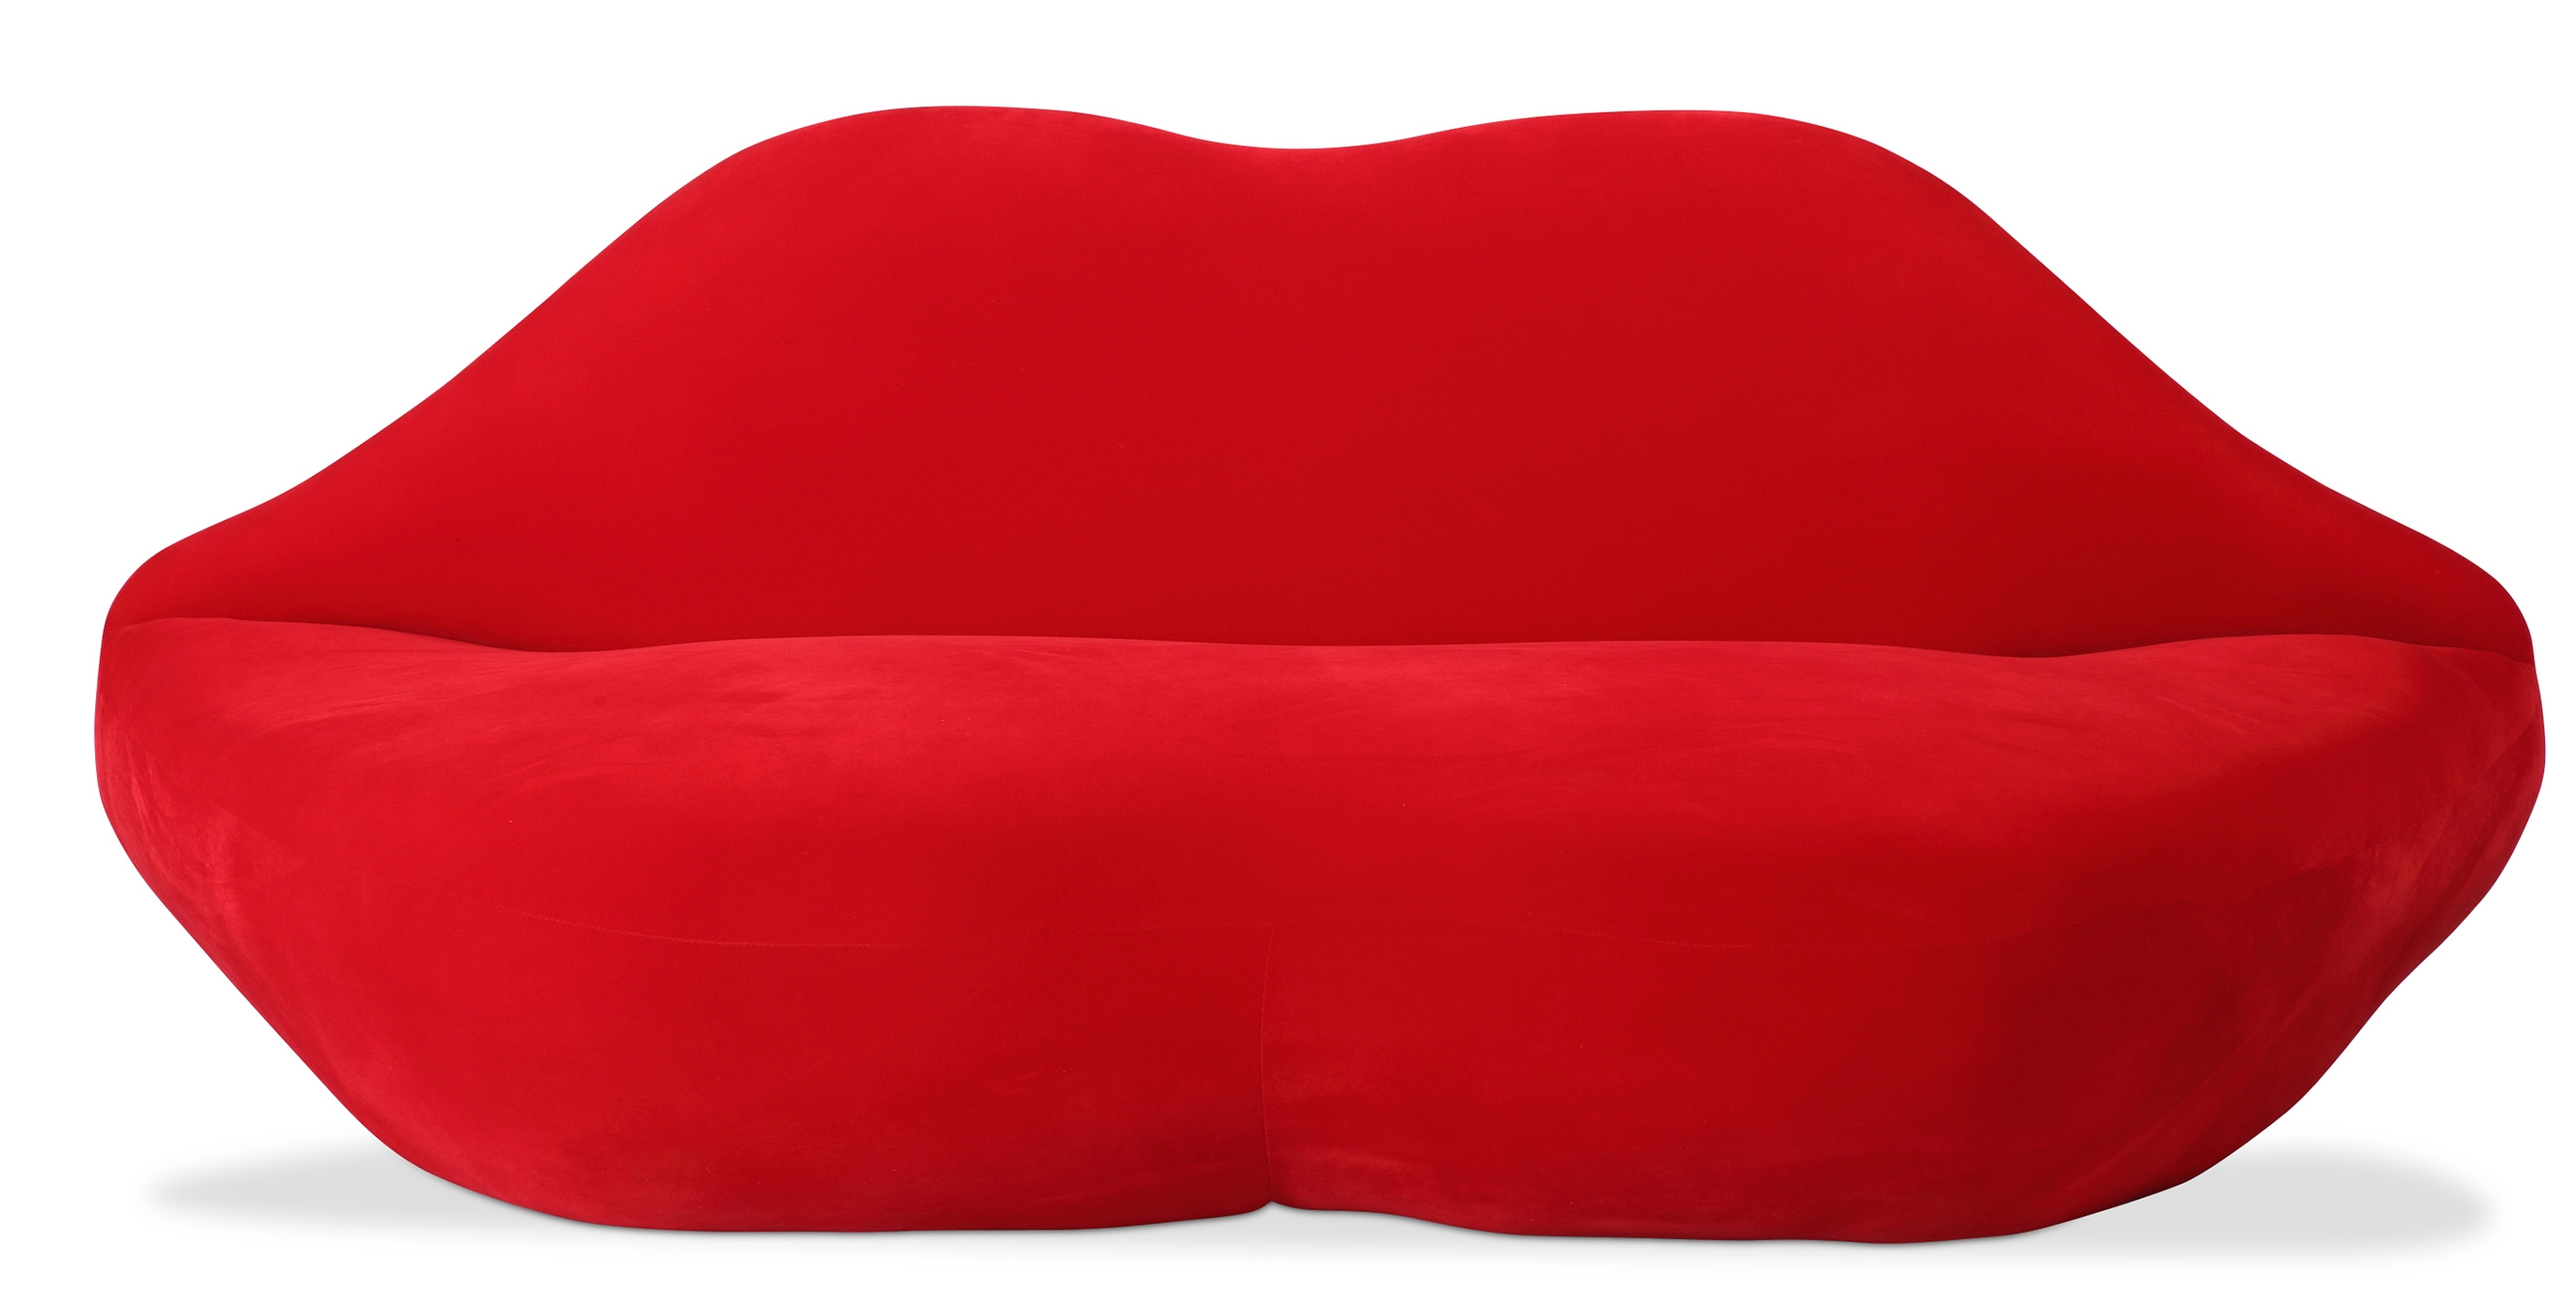 Canape l vre tissu rouge inspir salvador dali - Canape rouge but ...